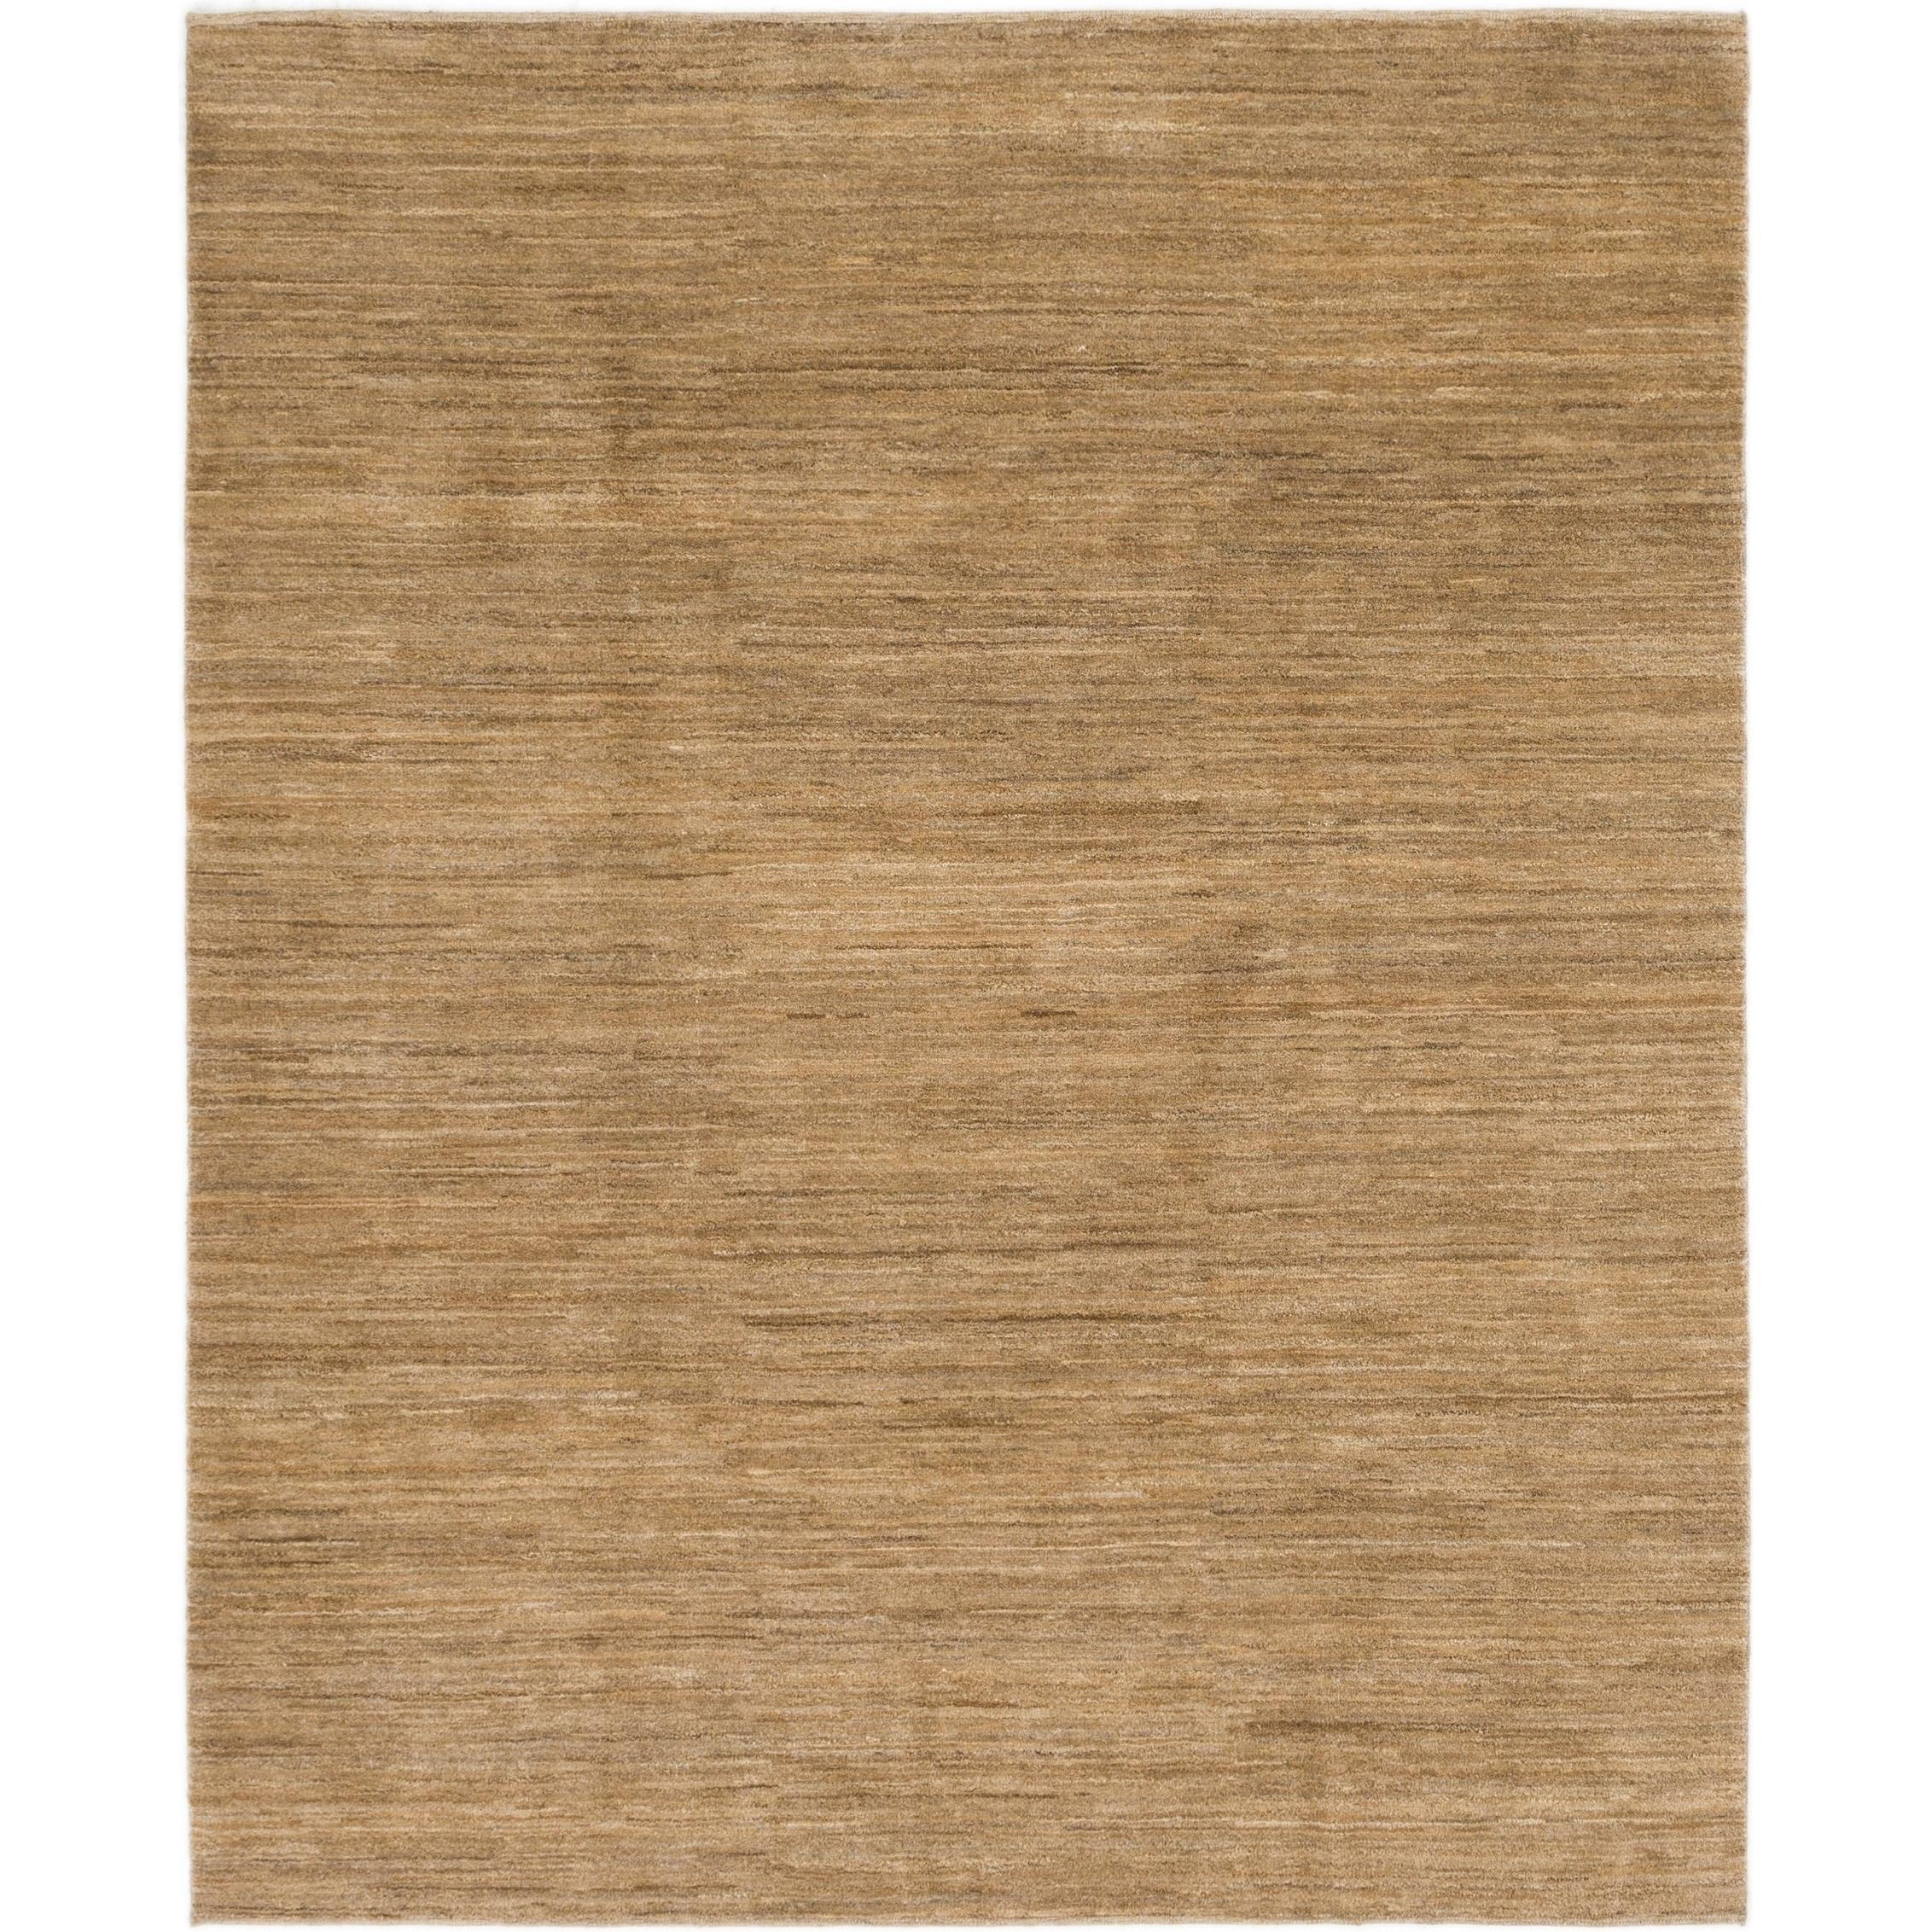 Hand Knotted Kashkuli Gabbeh Wool Area Rug - 6 10 x 8 3 (Beige - 6 10 x 8 3)